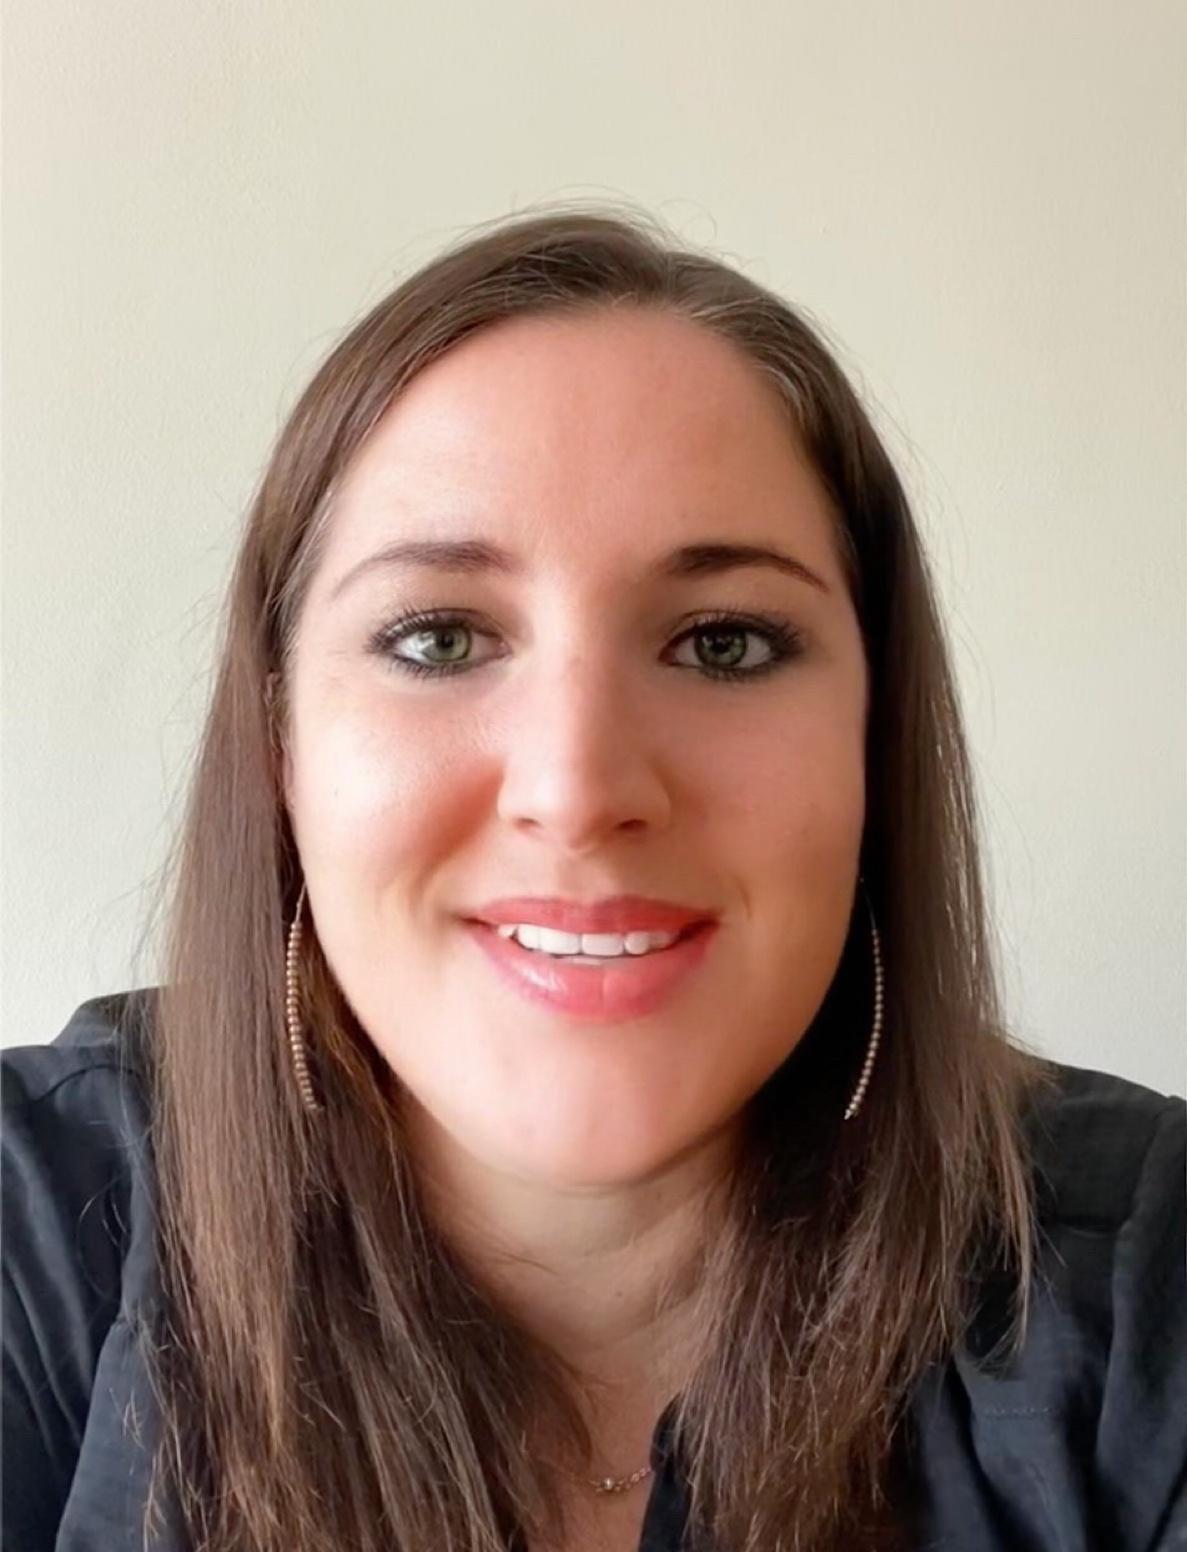 Danielle Lopreste